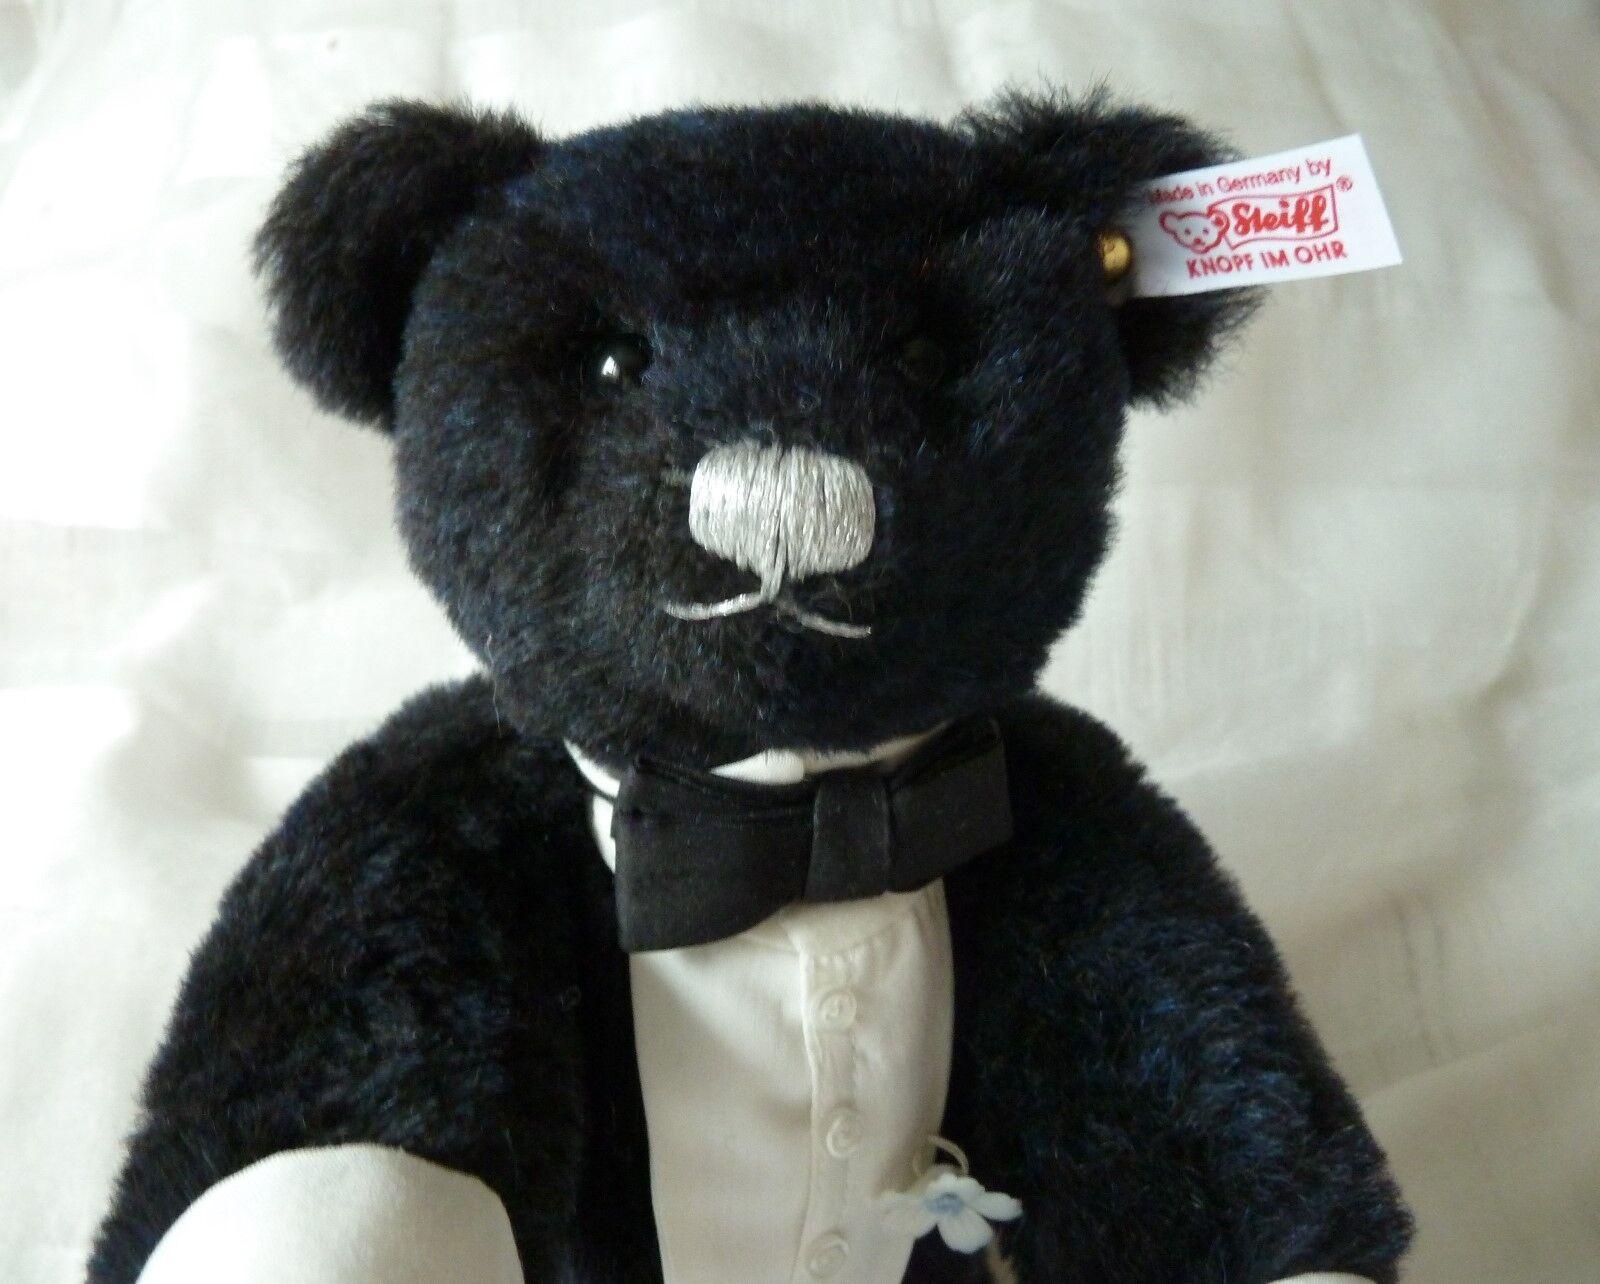 Steiff Bräutigam aus Set glückliche Brautpaar 677083 Teddybär Teddy Bär Hochzeit